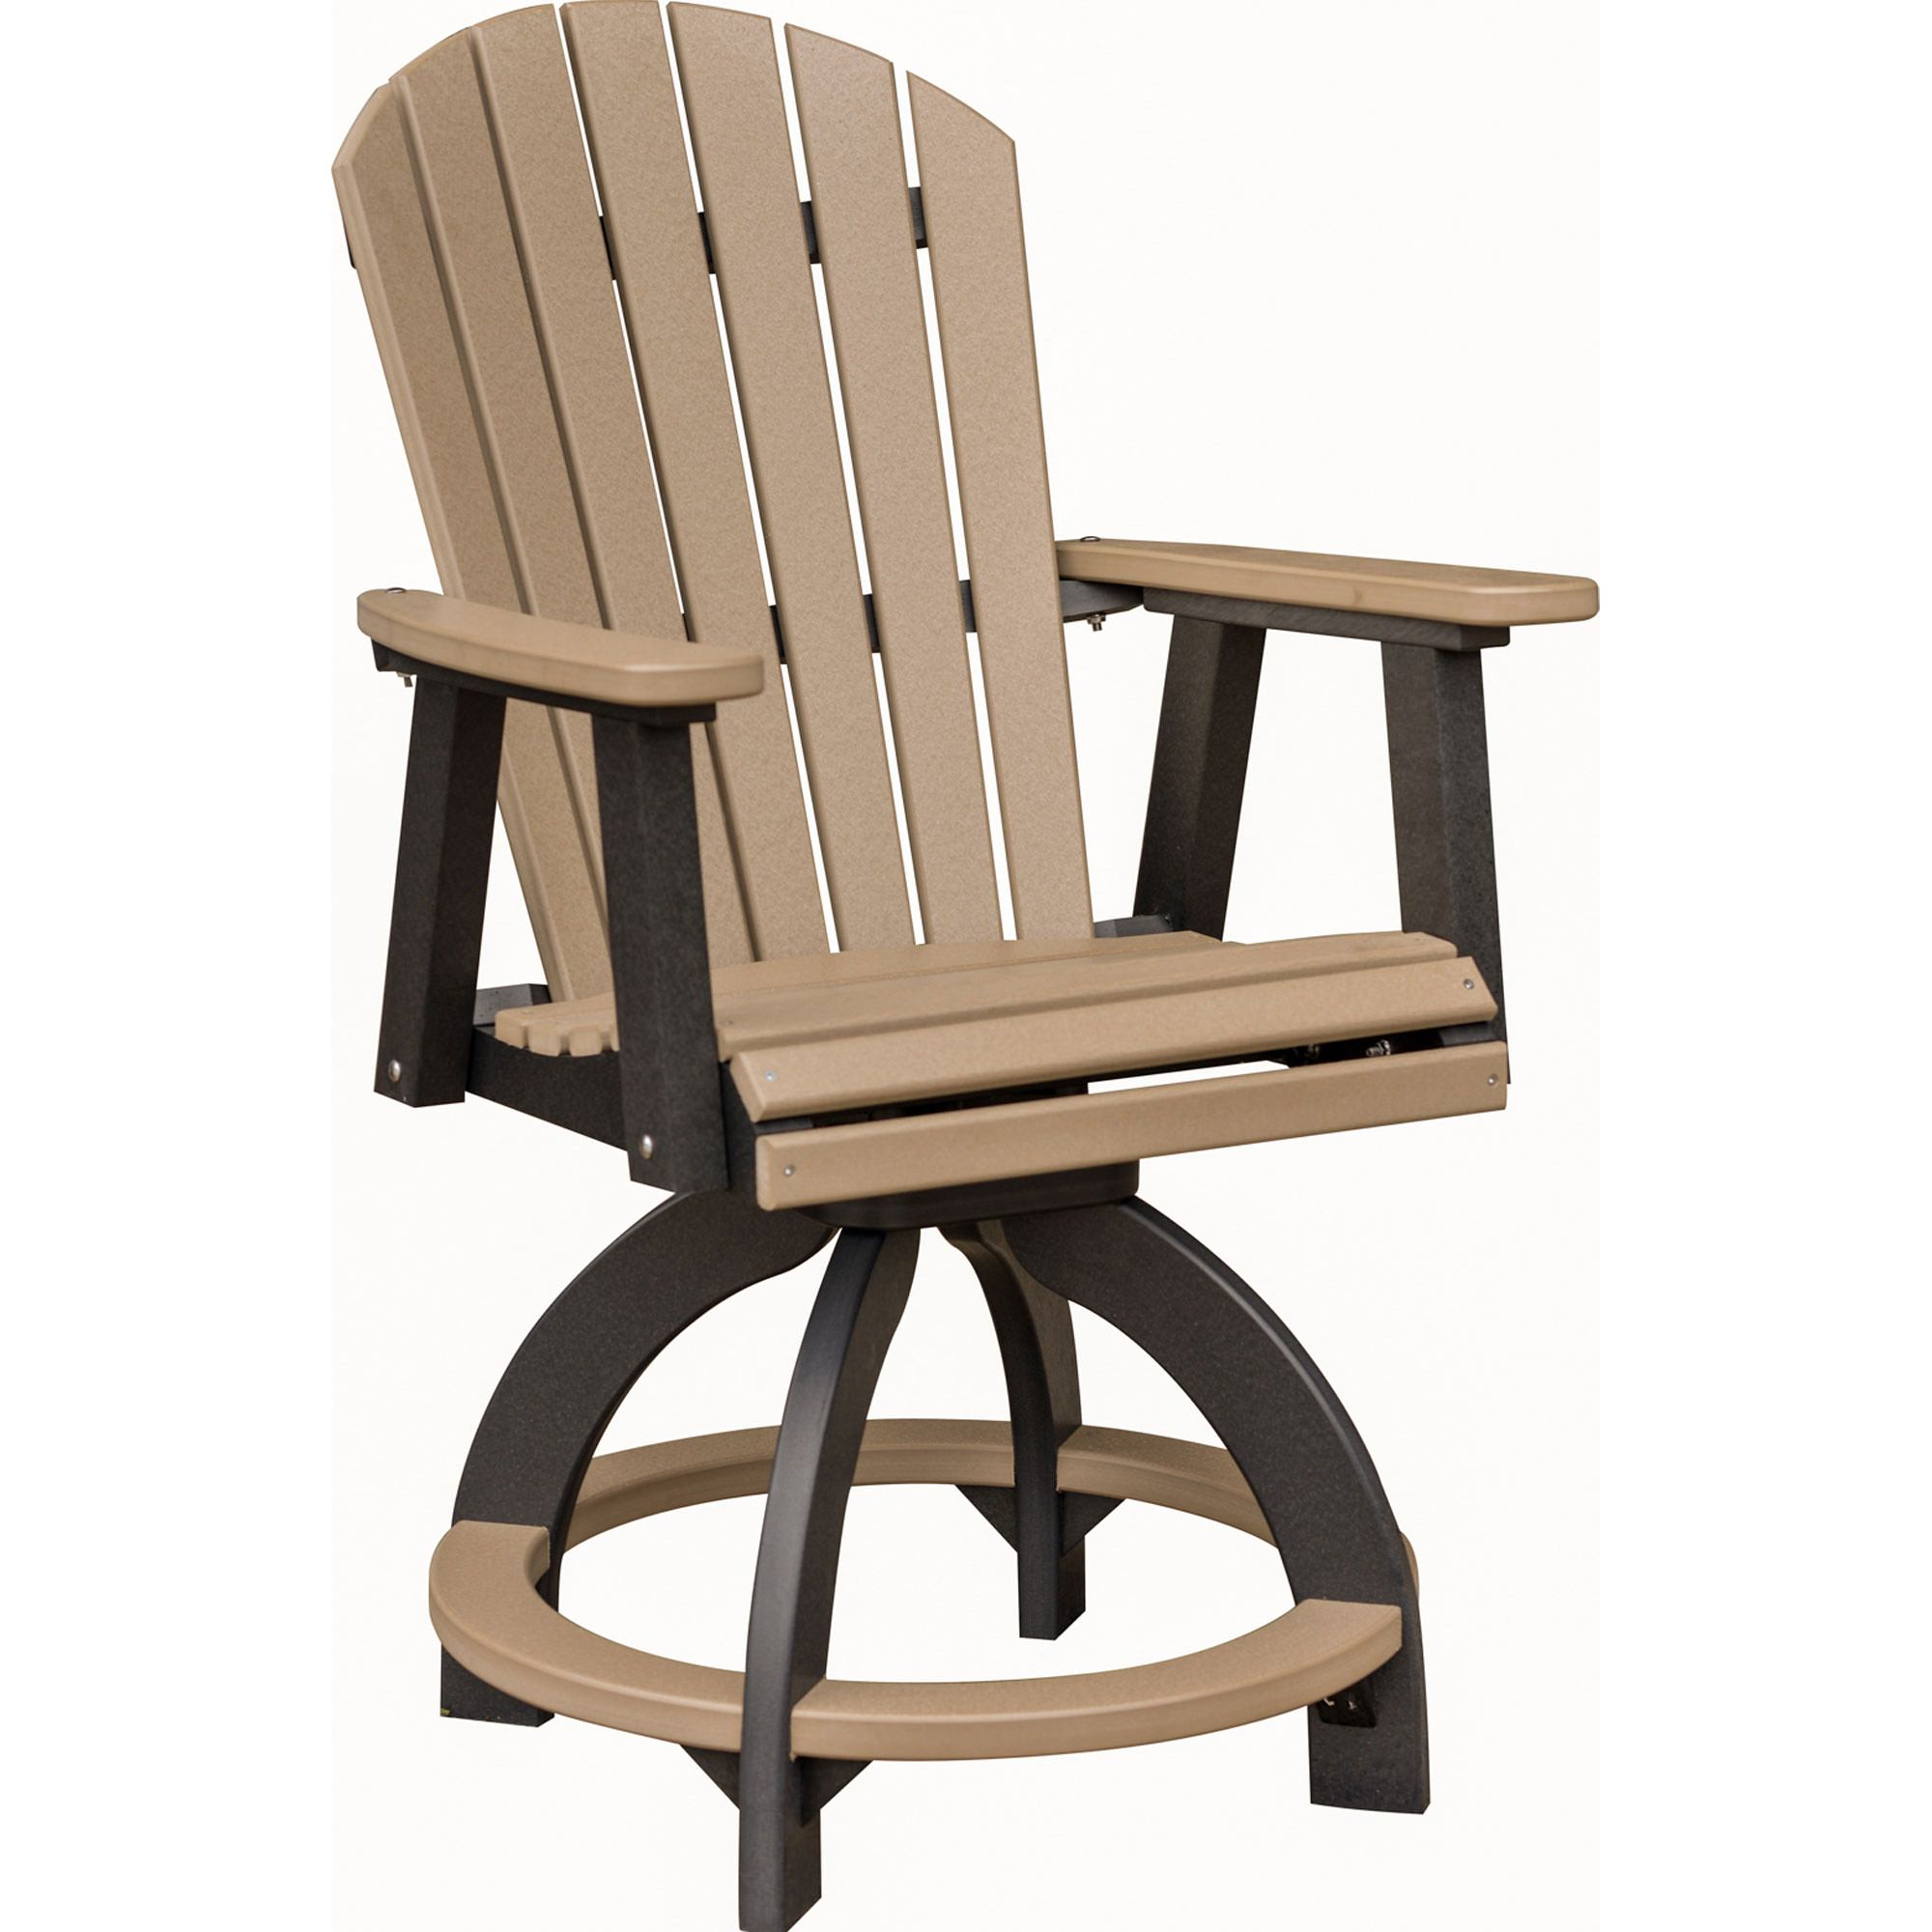 comfo back swivel counter chair berlin gardens dfohome. Black Bedroom Furniture Sets. Home Design Ideas